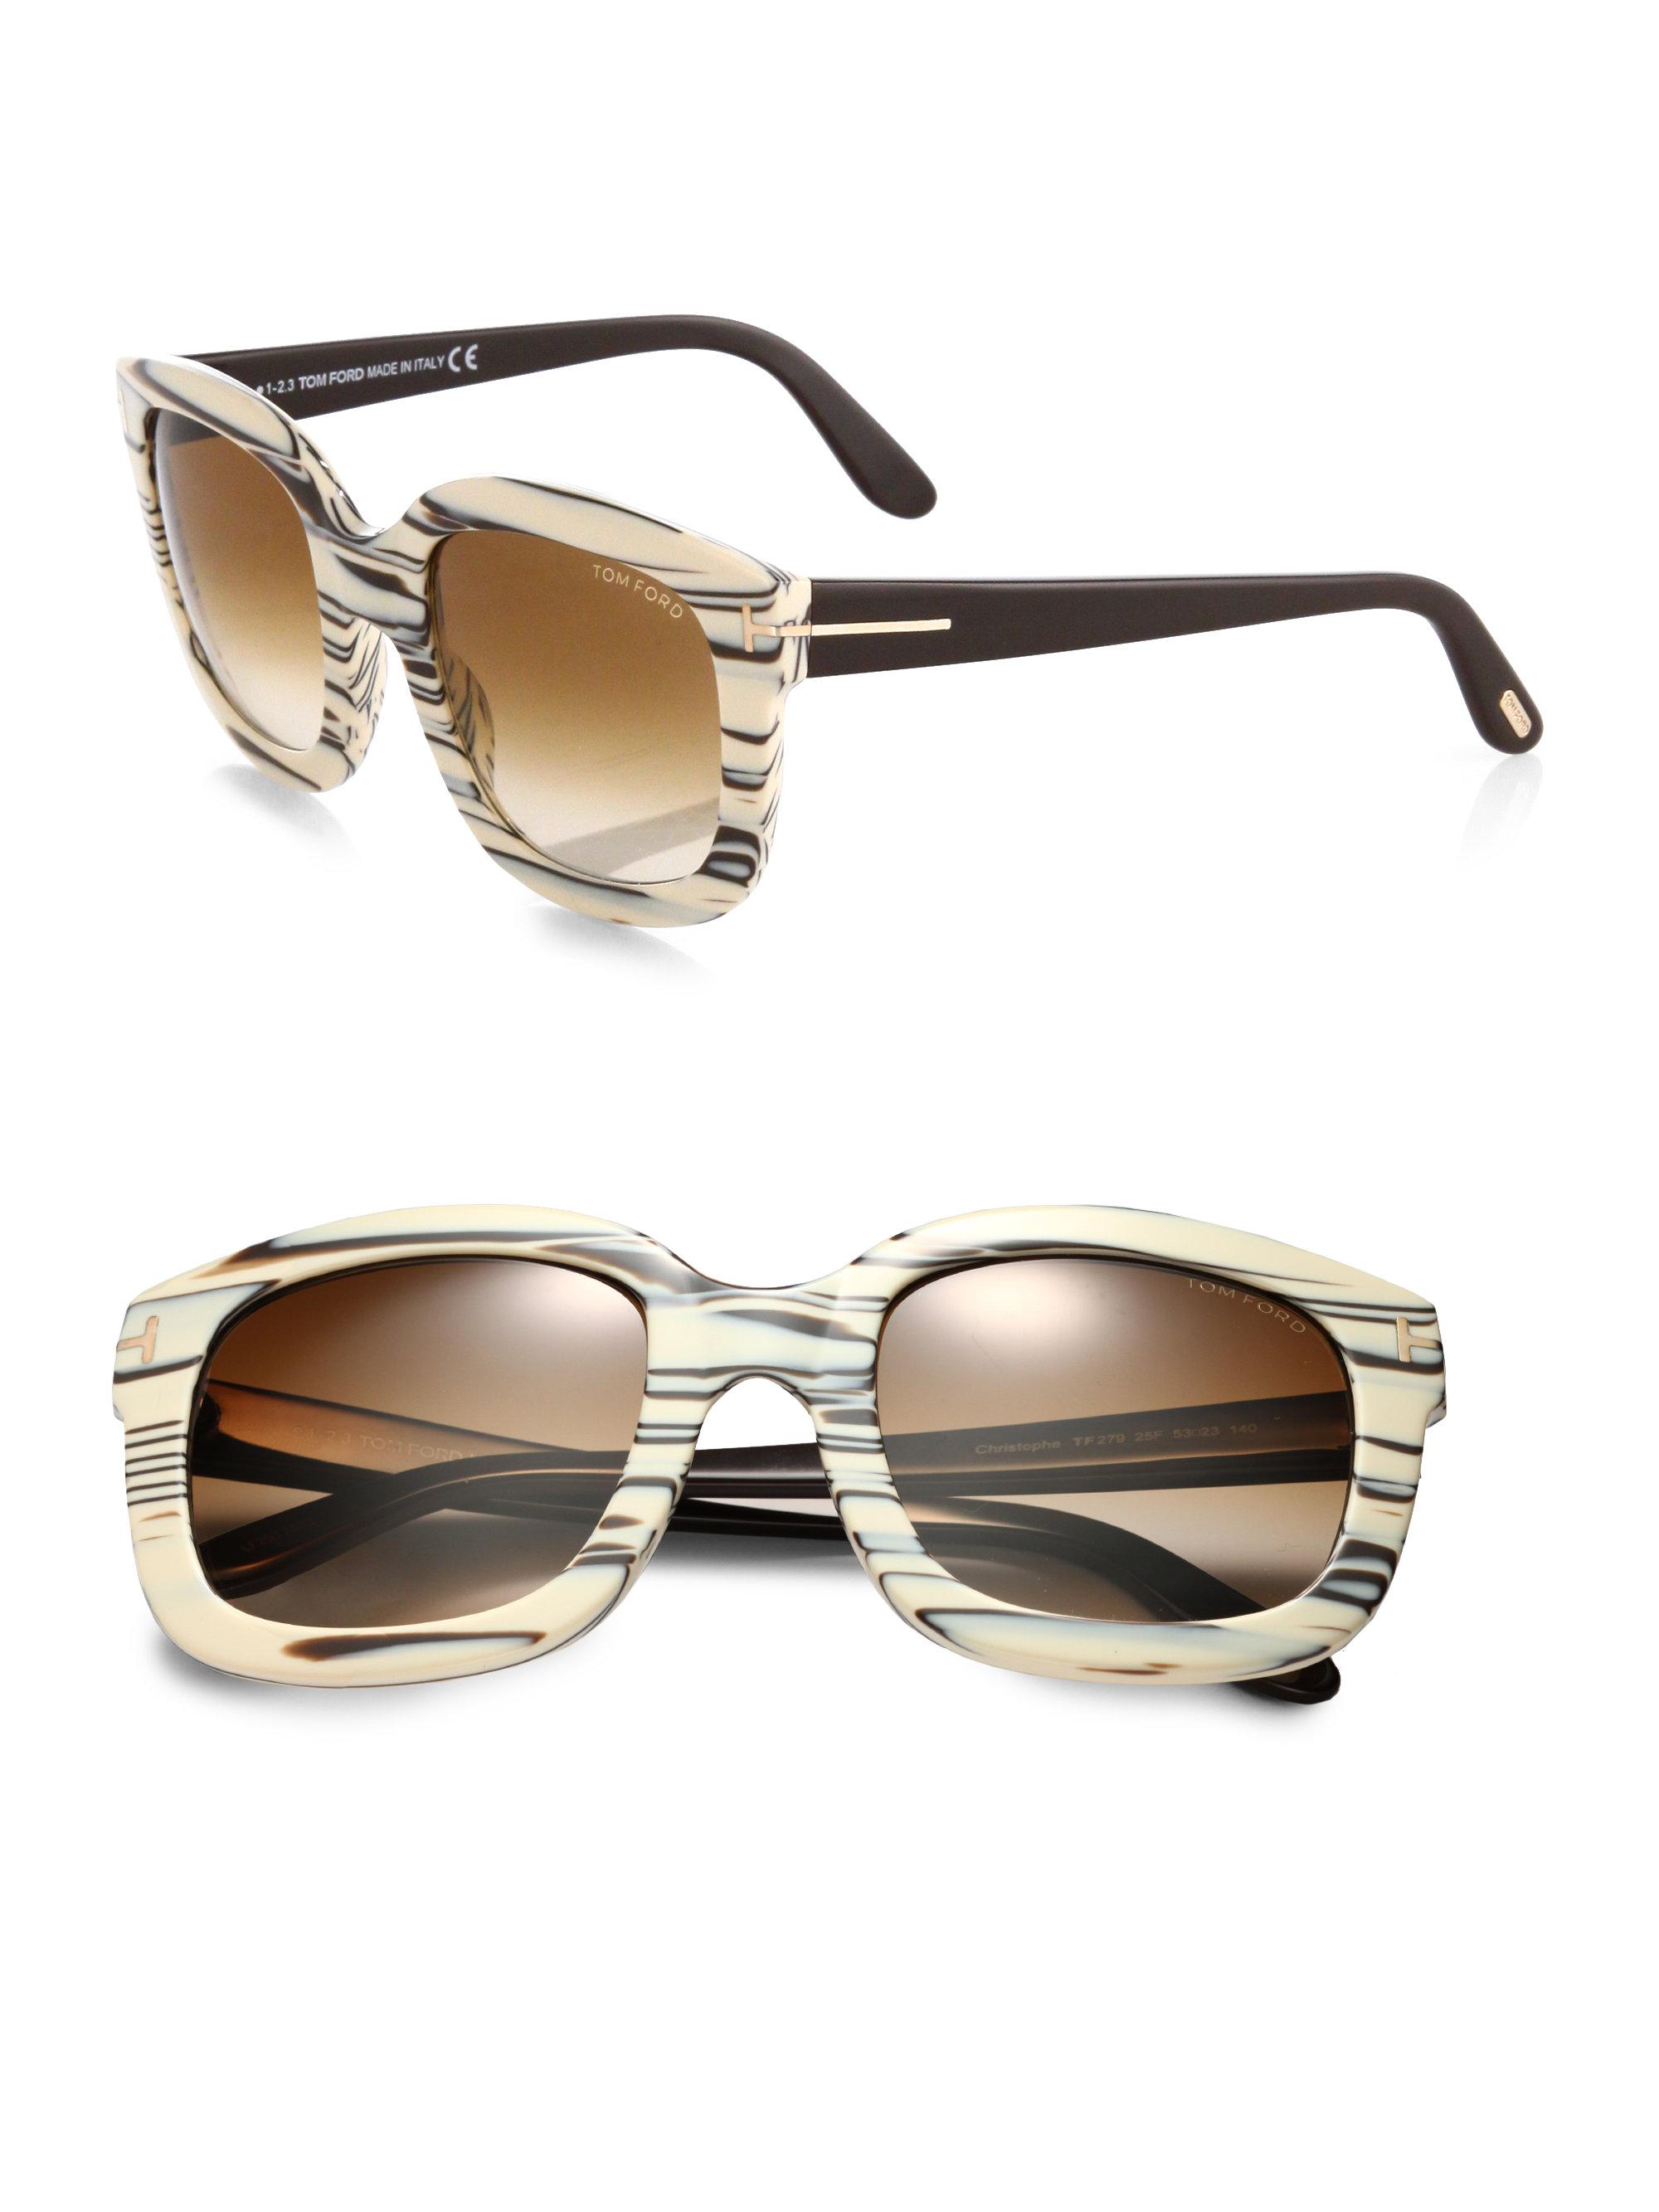 lyst tom ford christophe oversized square sunglasses in. Black Bedroom Furniture Sets. Home Design Ideas